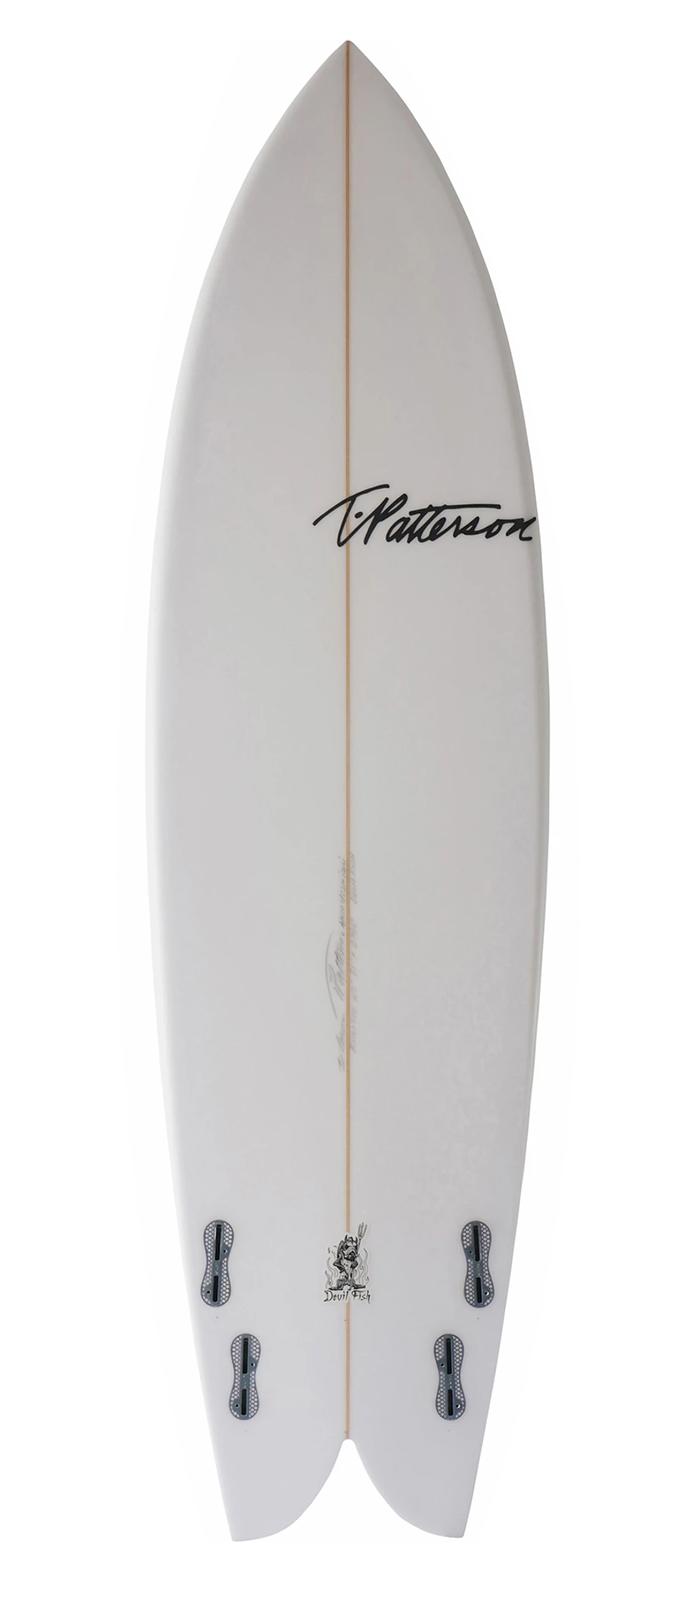 DEVIL FISH surfboard model bottom